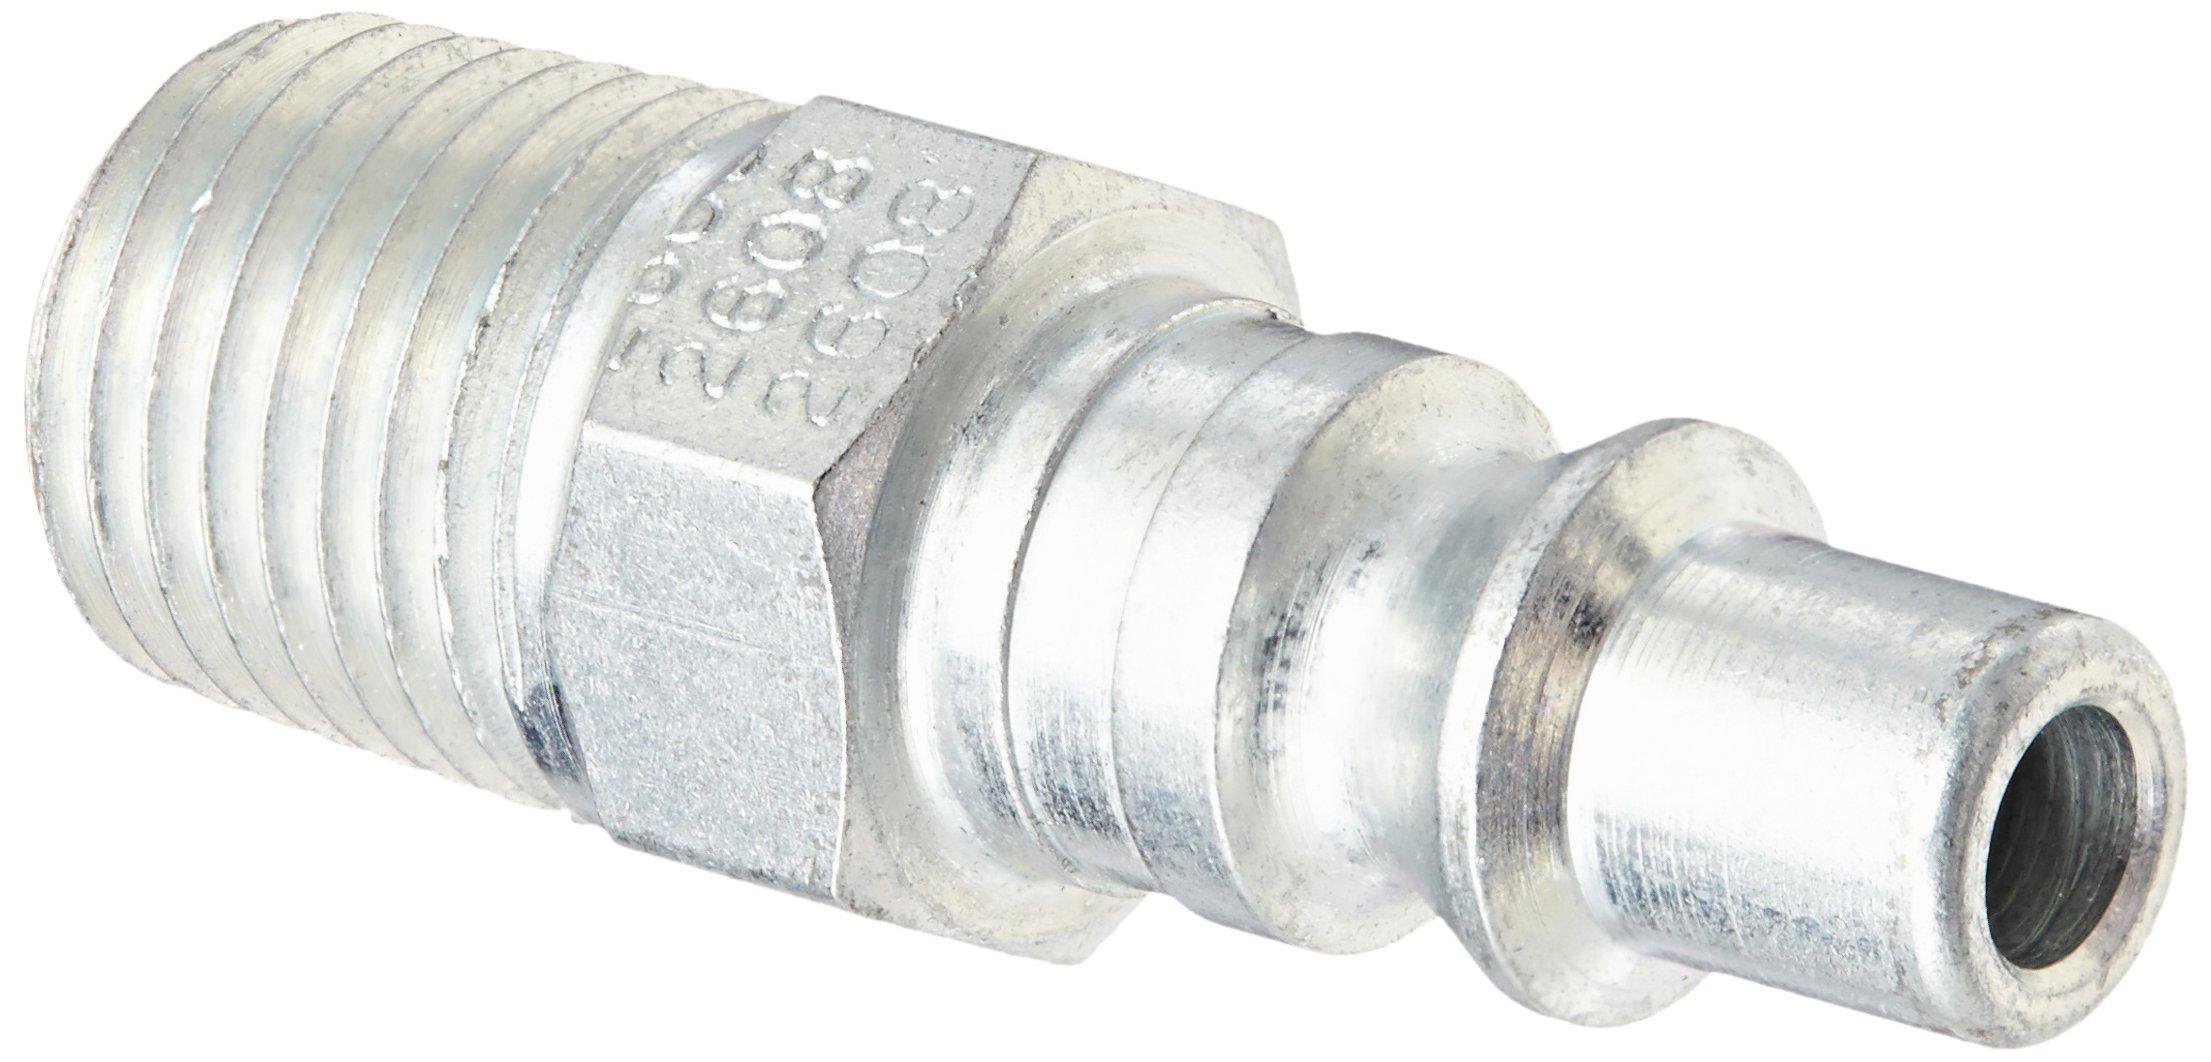 "Eaton Hansen 2608 Steel 210/310 Series ARO Interchange, Coupler Plug, 1/4"" Body Size x 1/4"" NPT Male"